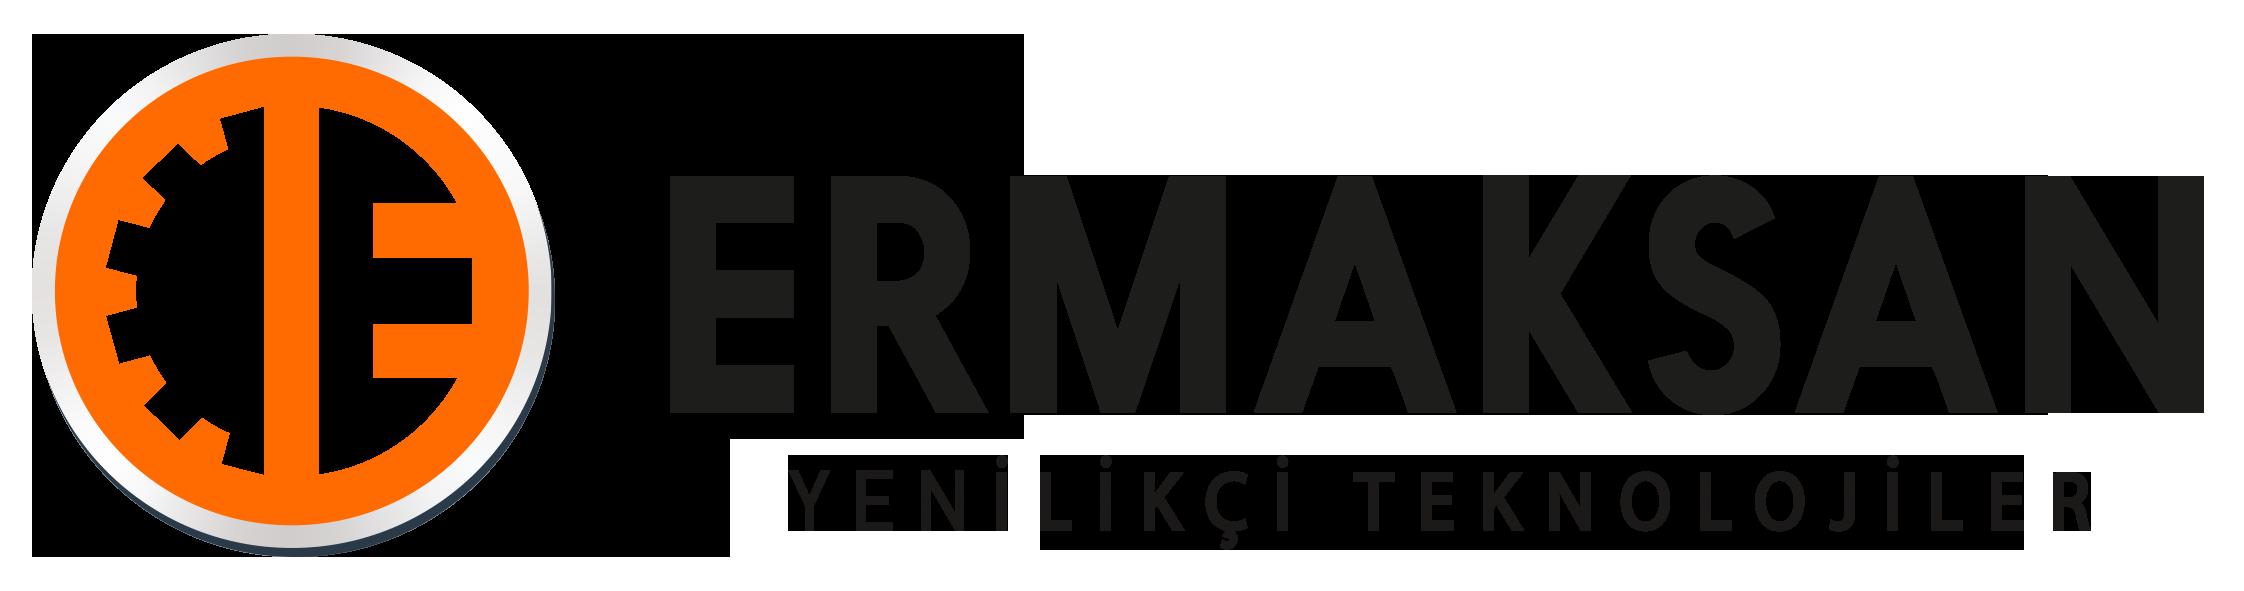 ERMAKSAN MAKİNA SANAYİ ve TİCARET A.Ş.